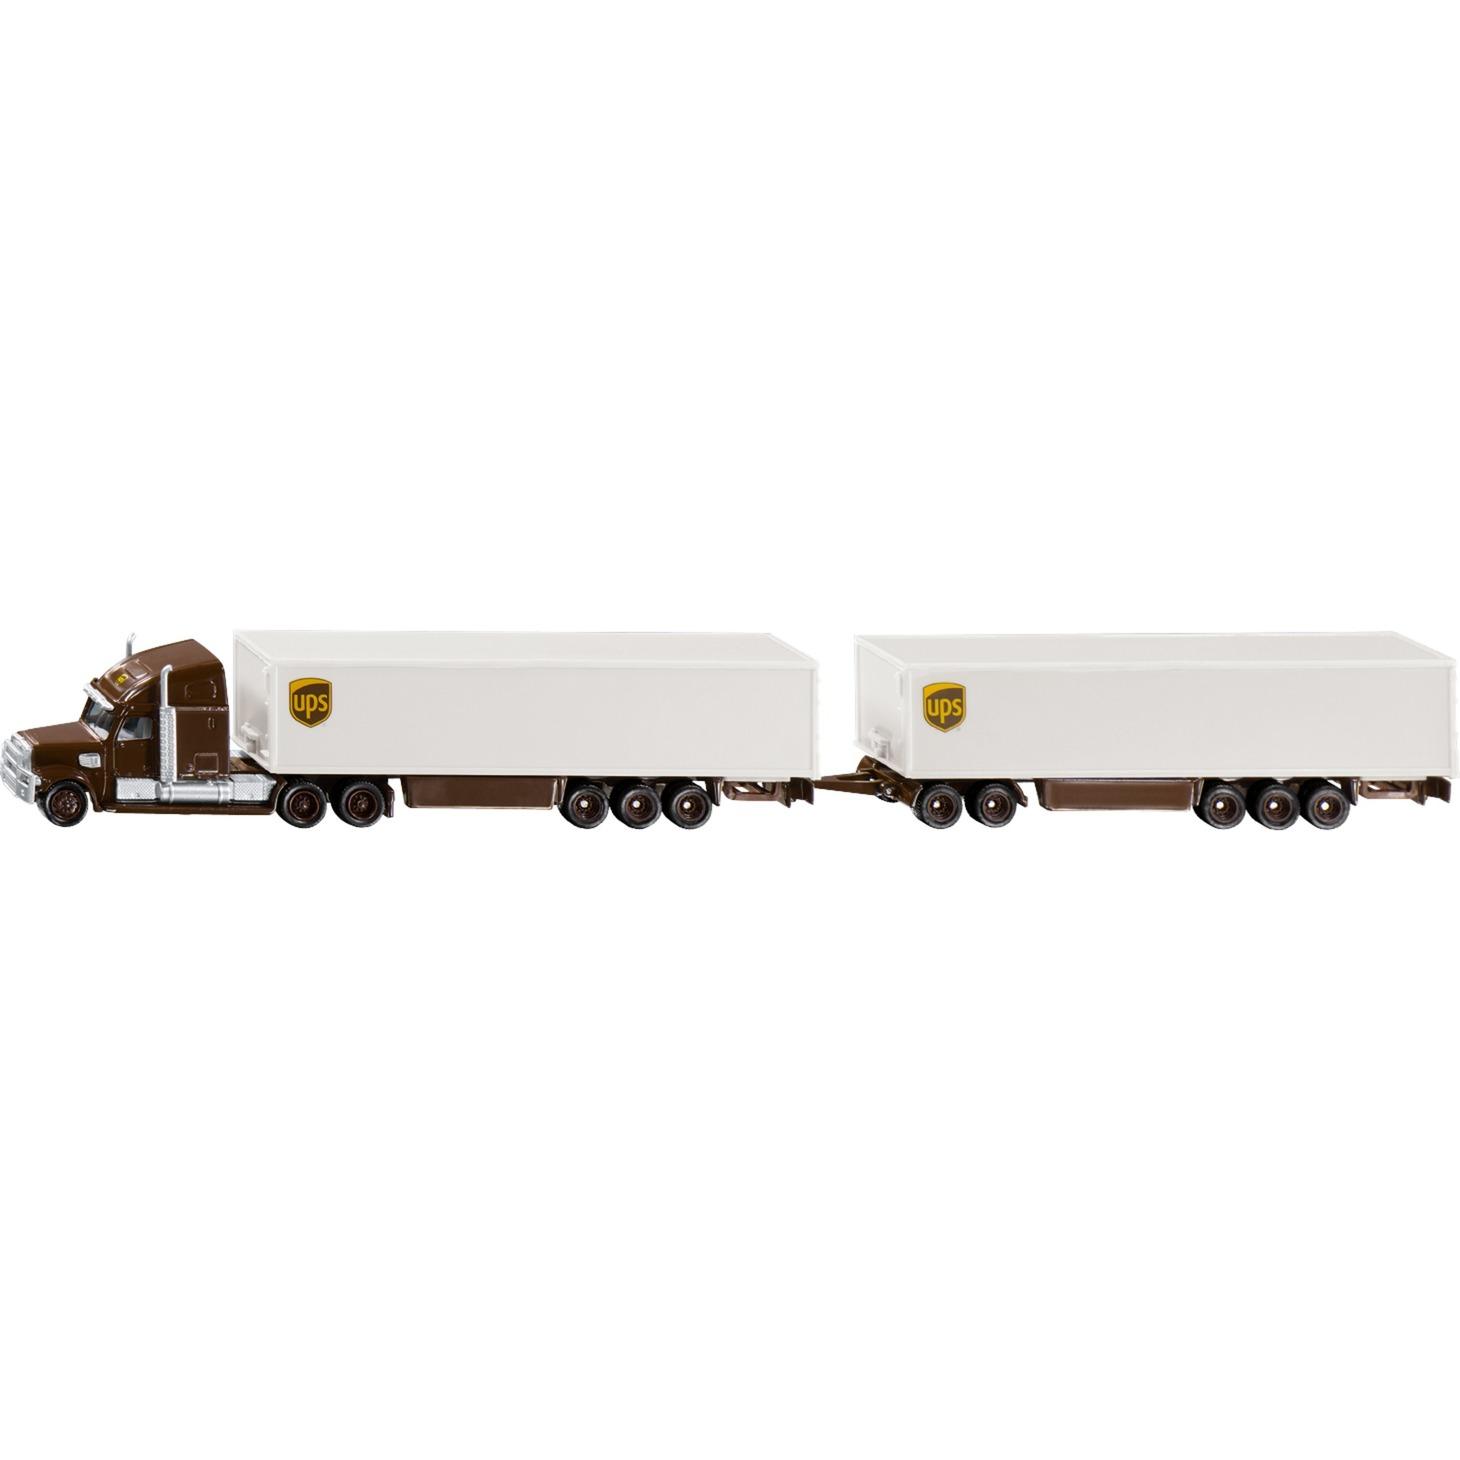 1806-formonterede-road-train-model-187-landkoretojsmodel-model-koretoj